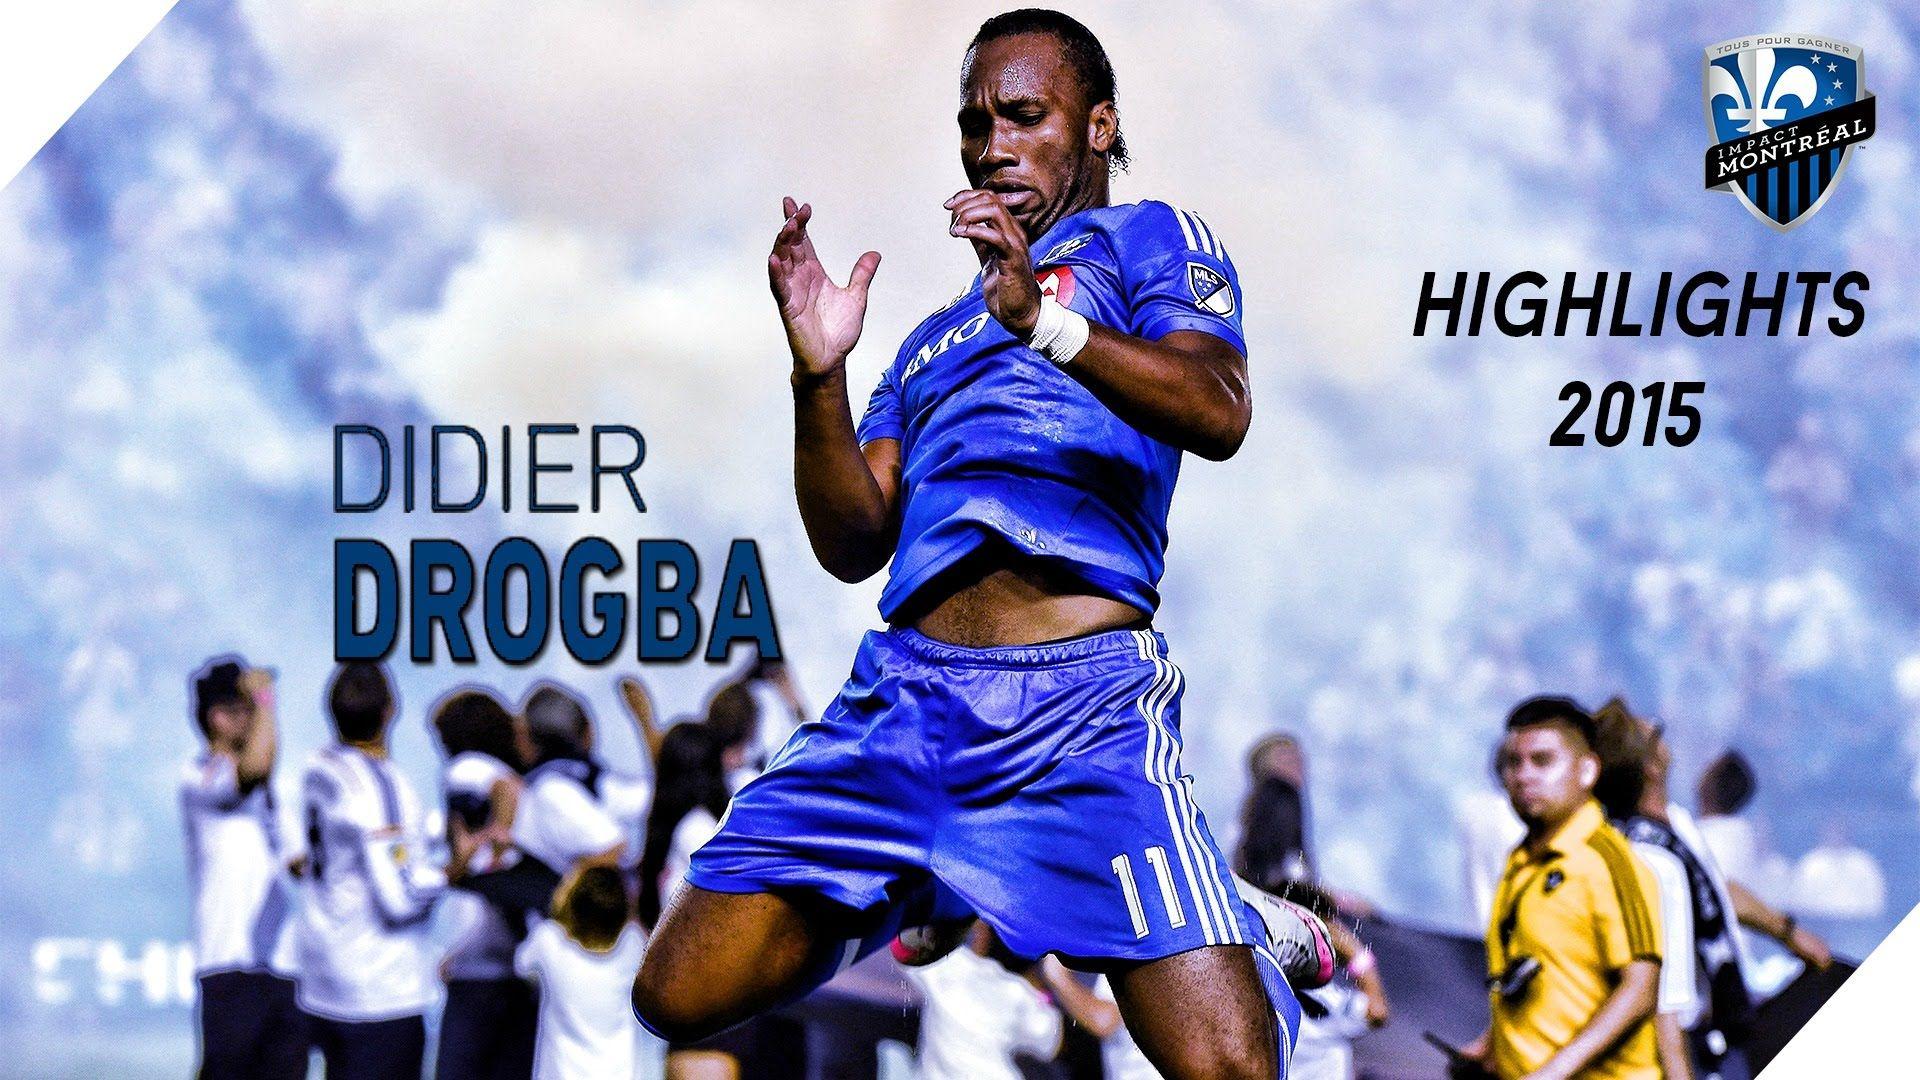 Didier Drogba Highlights 2015 ★Impact de Montréal